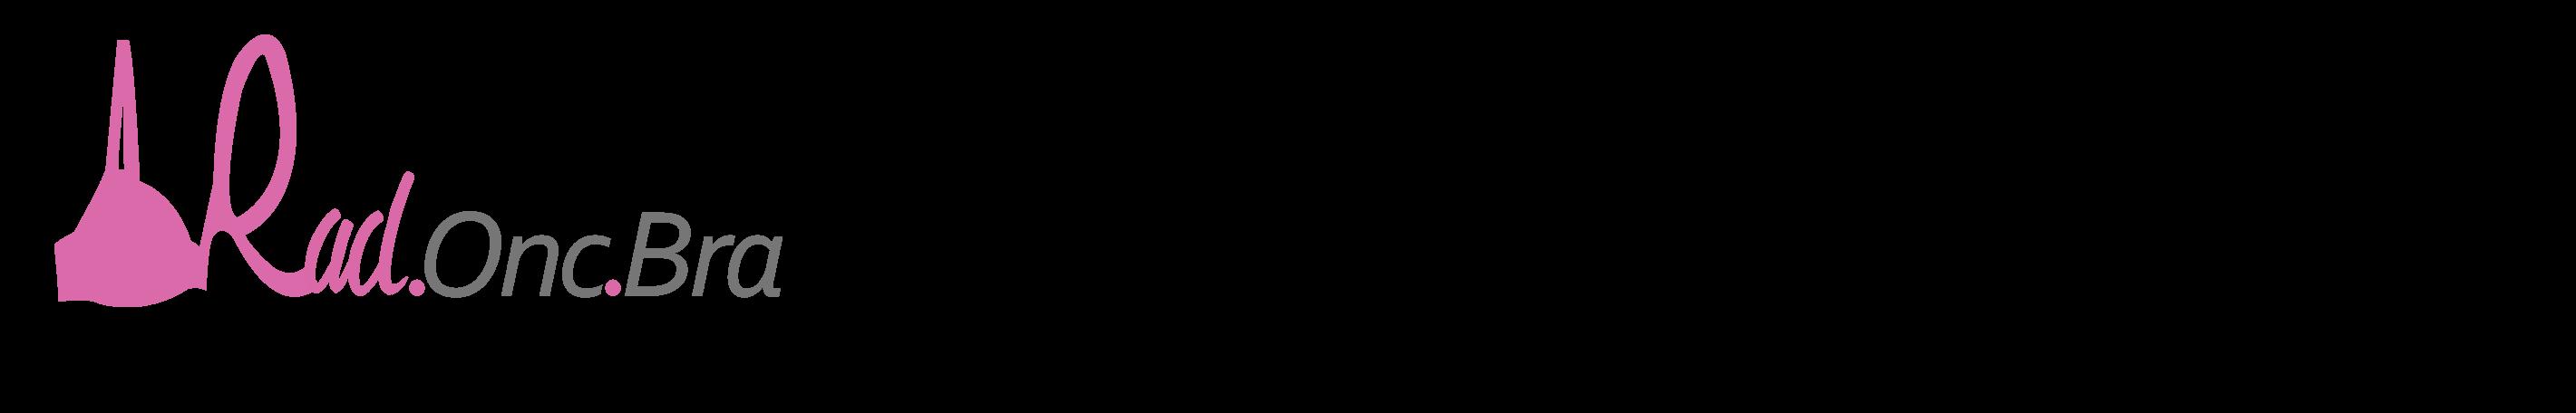 Radoncbra